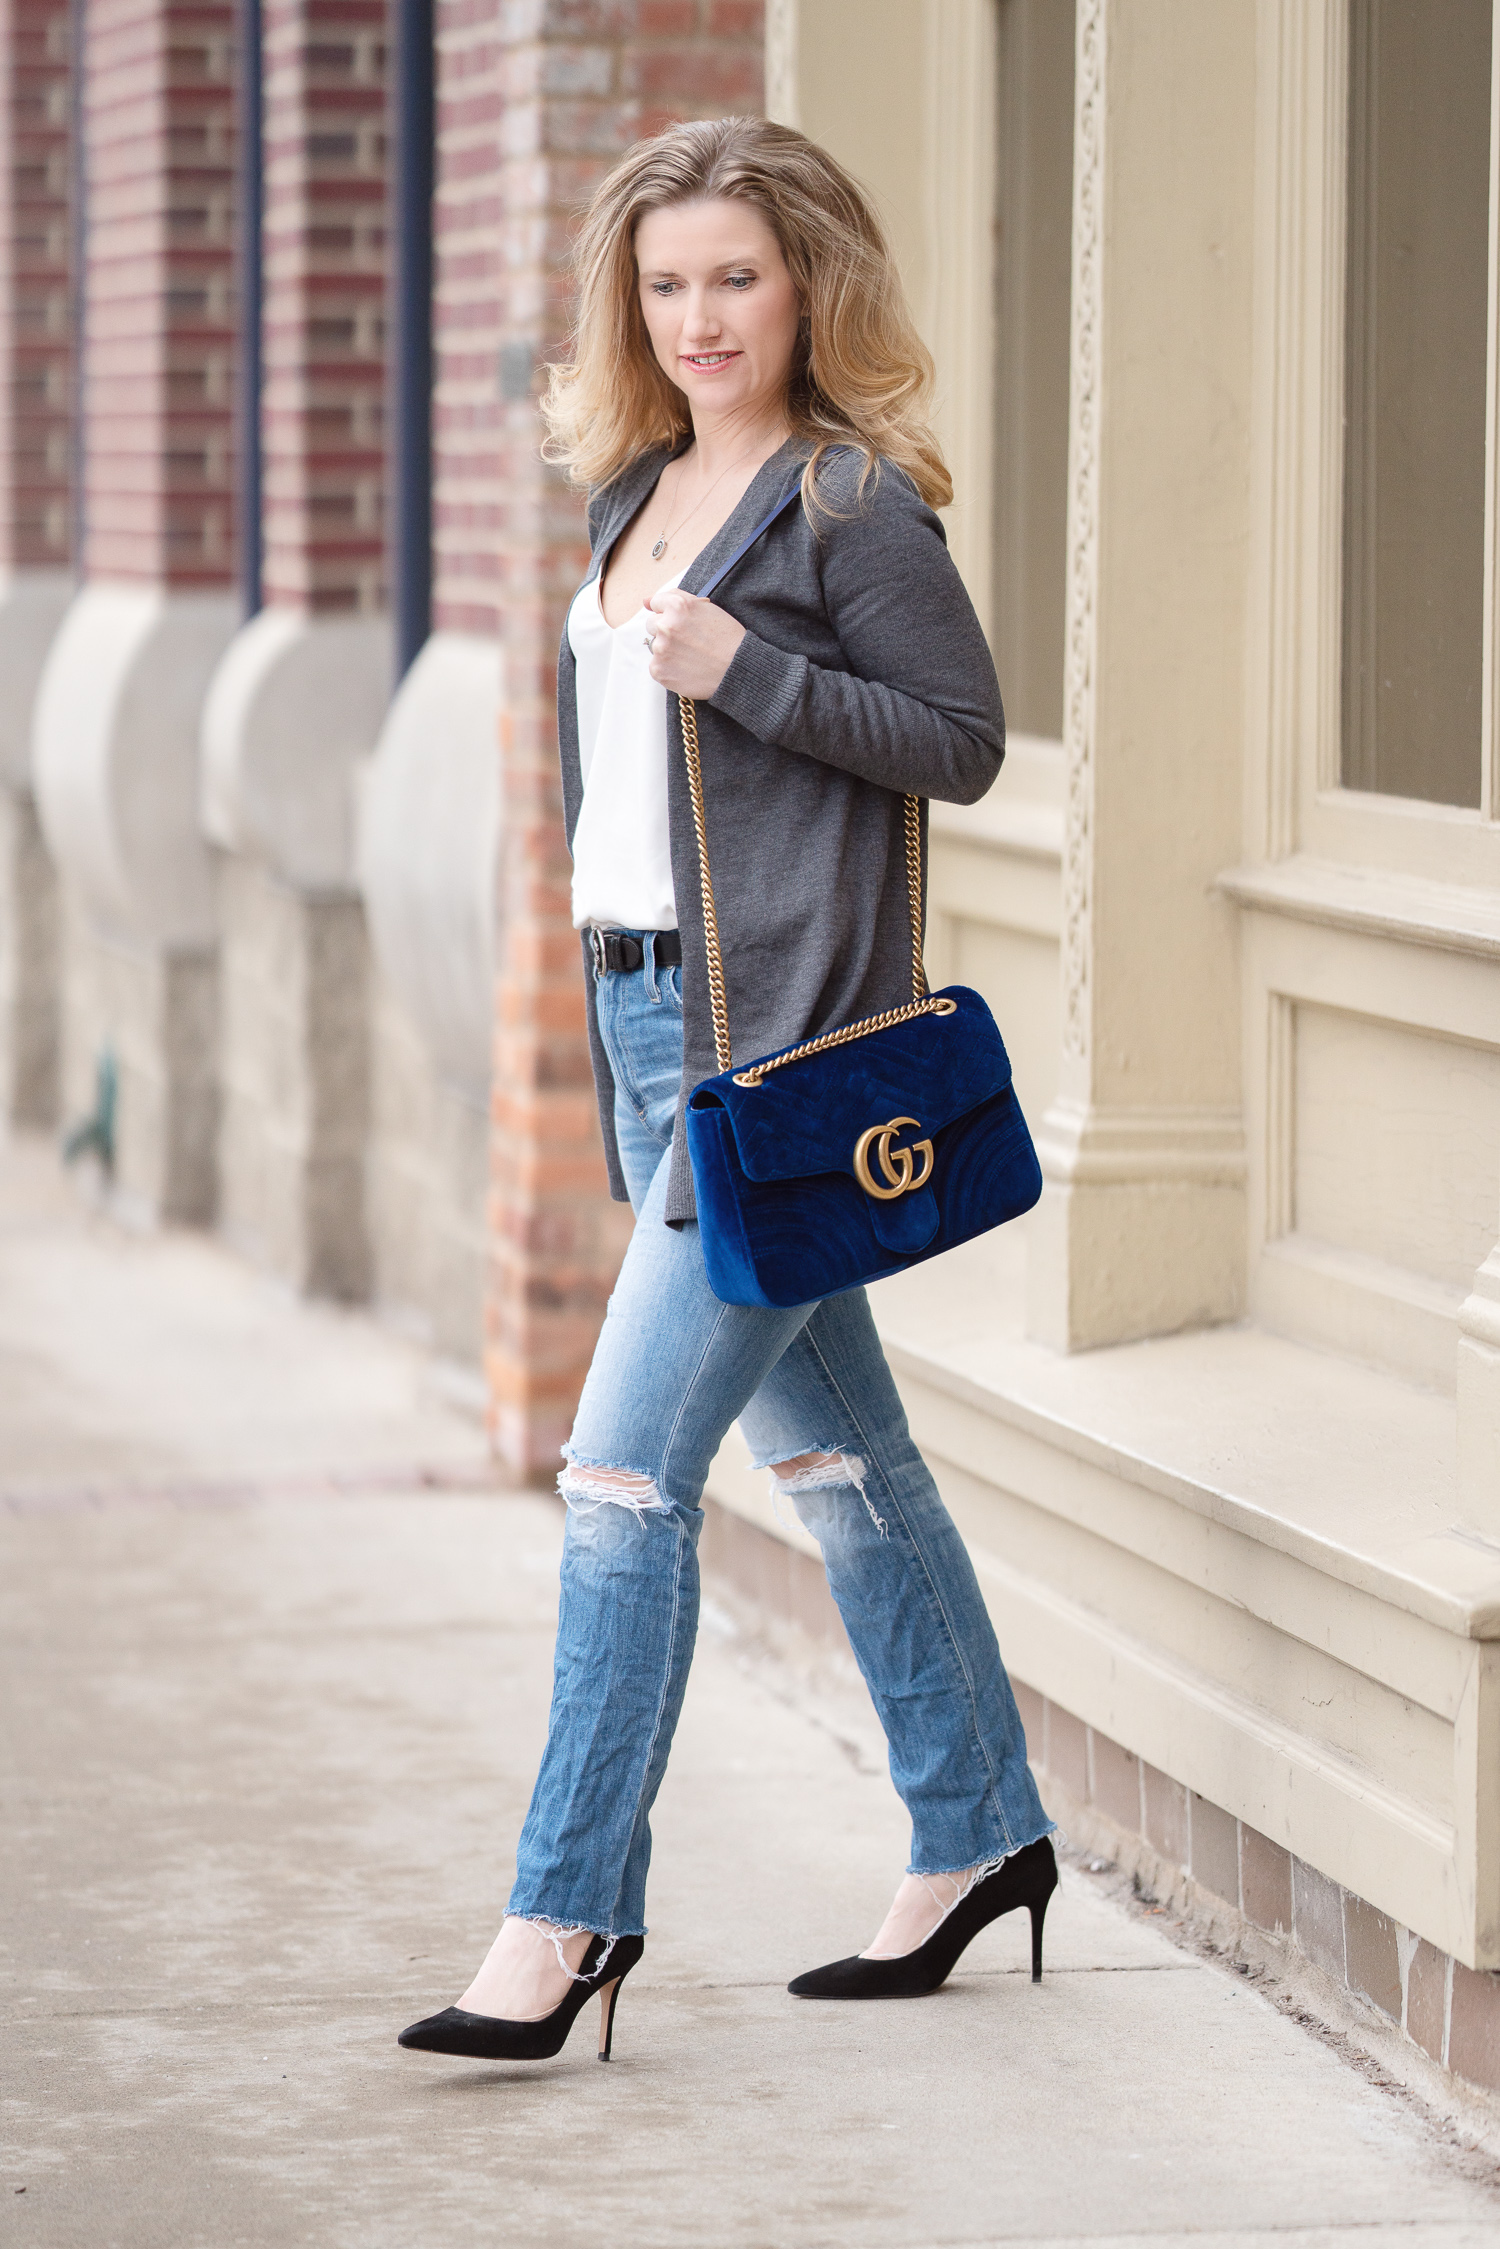 ce5701eea89 ... Gucci Marmont Velvet Bag